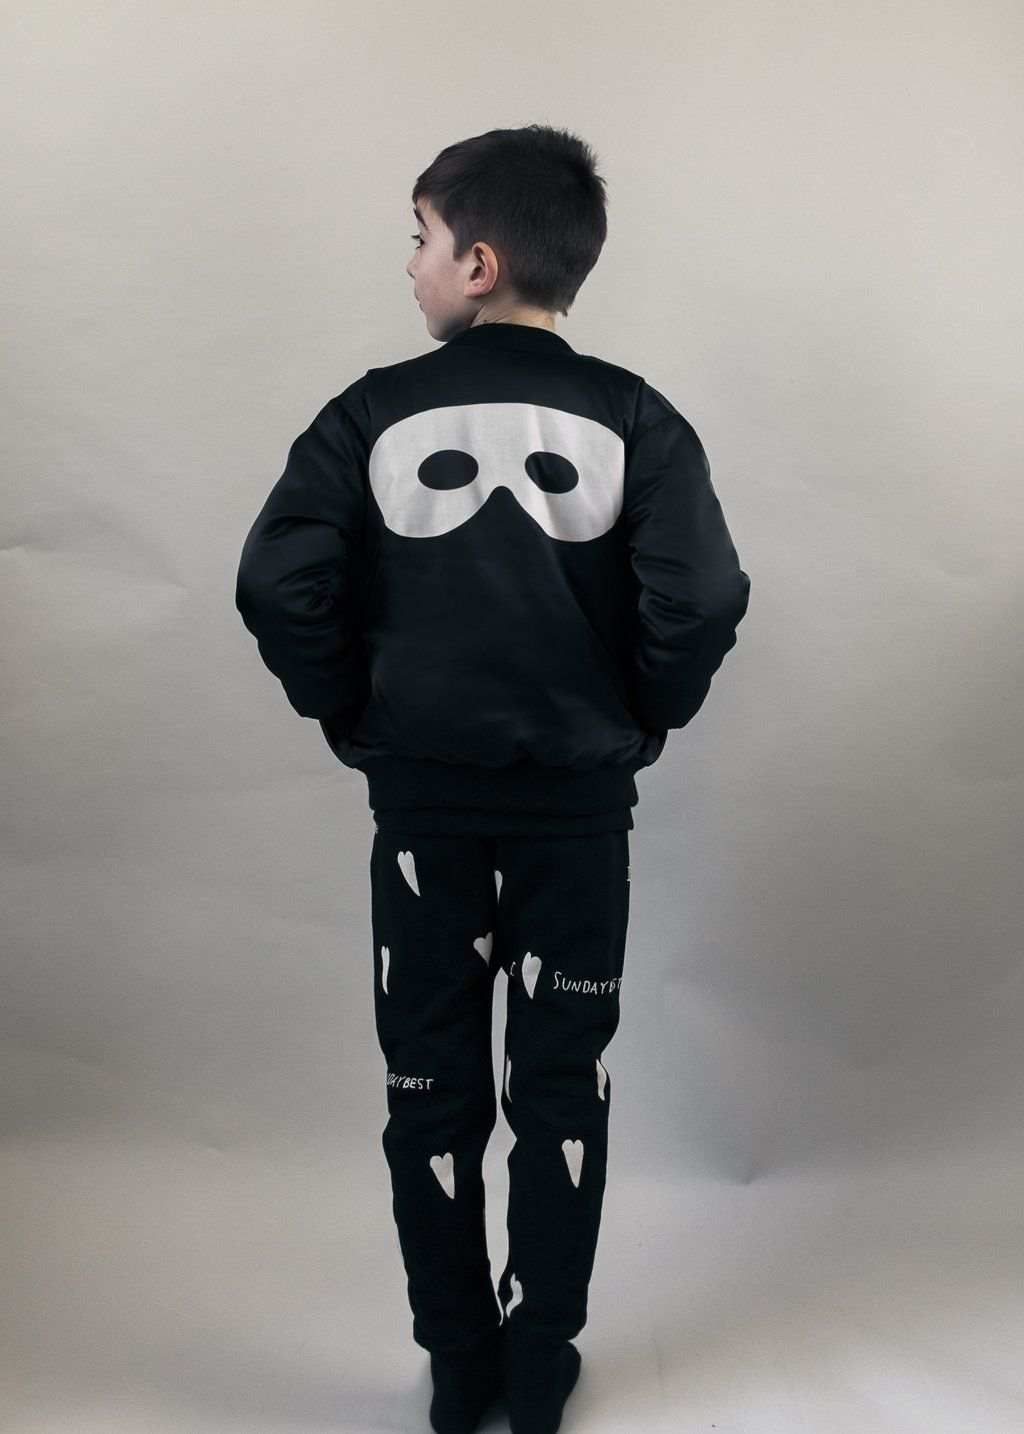 b1f5c1368 Beau Loves - We Love You bomber jacket - black - Scout & Co Kids ...